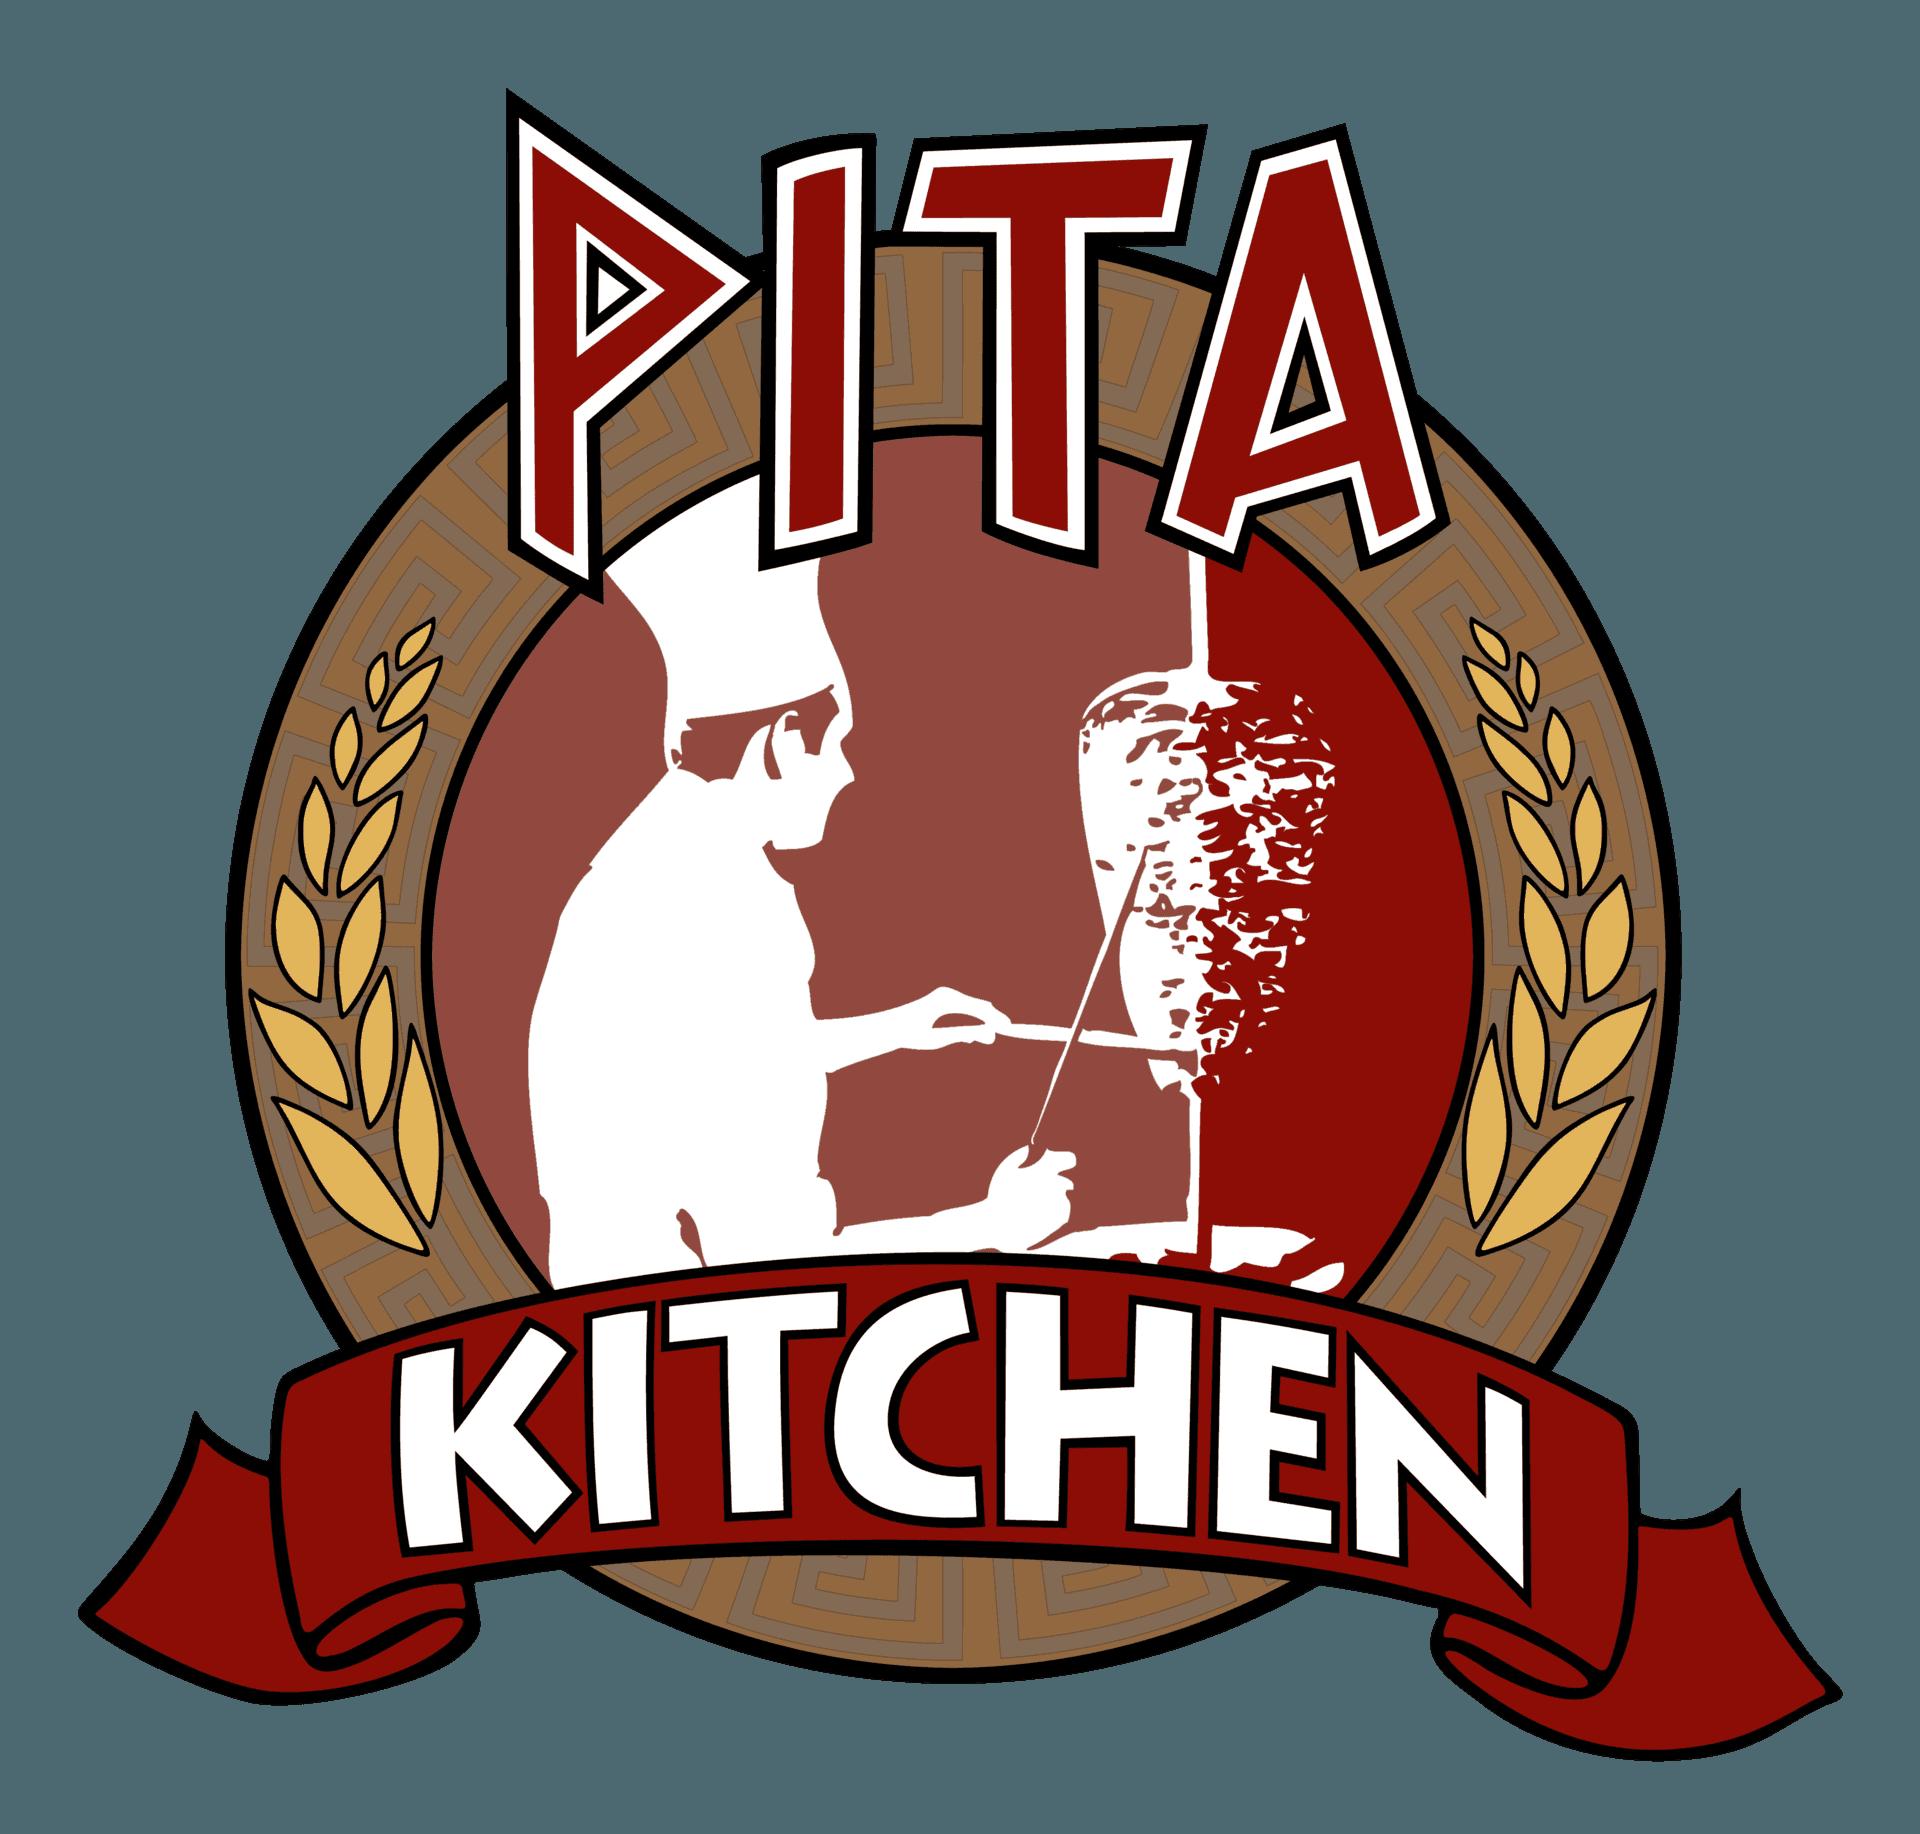 Pita Kitchen Sacramento: Pita Kitchen Sherman Oaks Hours